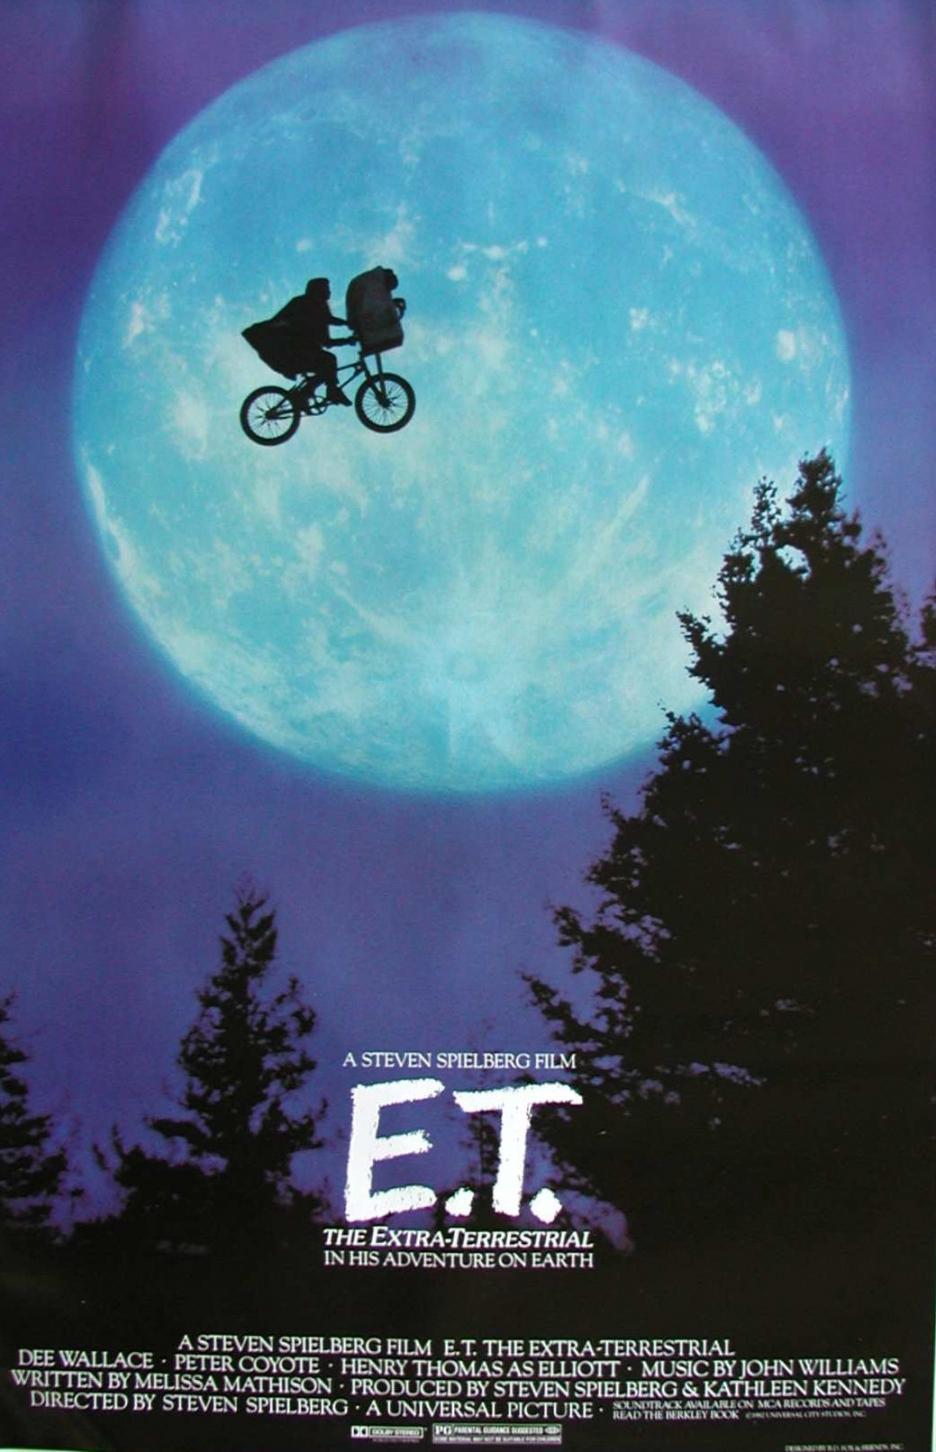 E.T. - E.T. The Extra-Terrestrial - Beyazperde.com